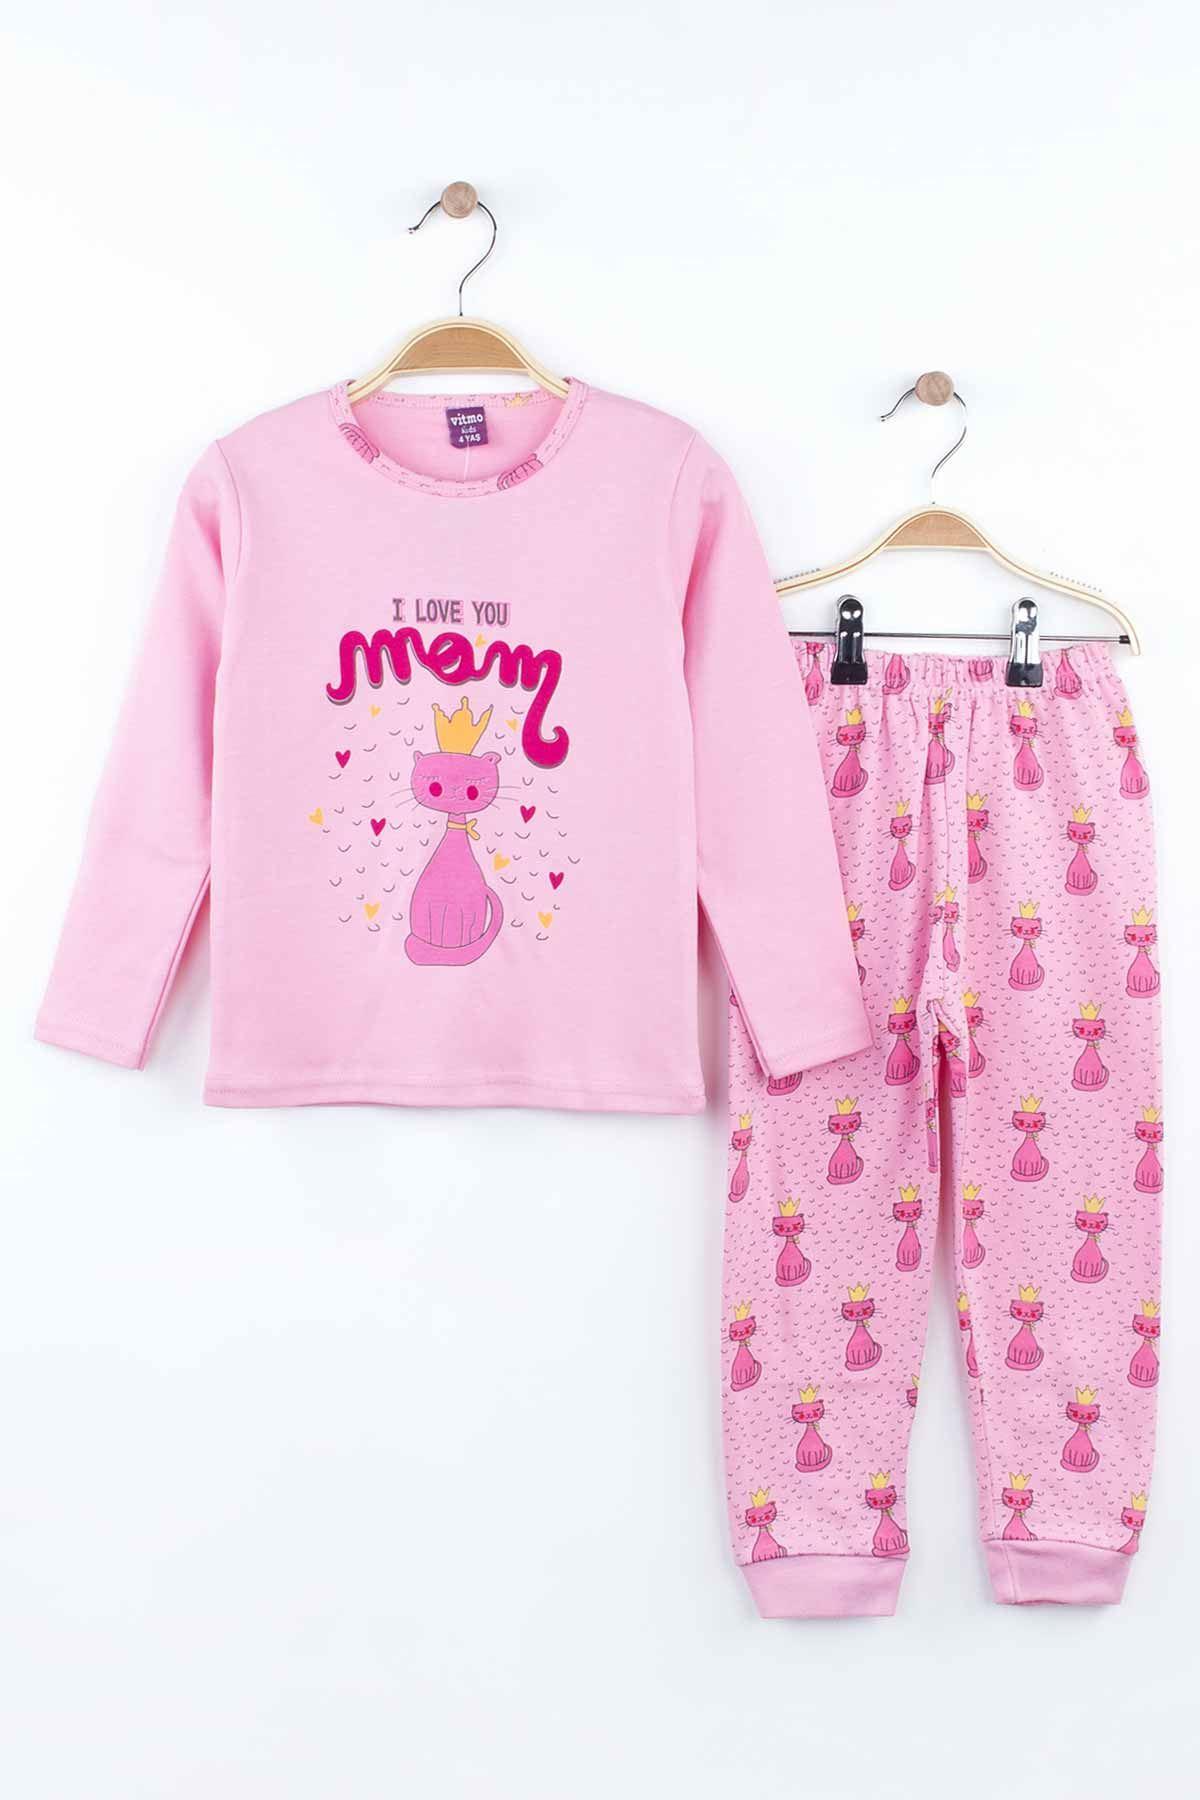 Pink Girls Pajamas Set Bottom Pajamas Top Pajamas Kids Daily Wear Homewear Cotton Comfortable Children Pajamas Sets Models